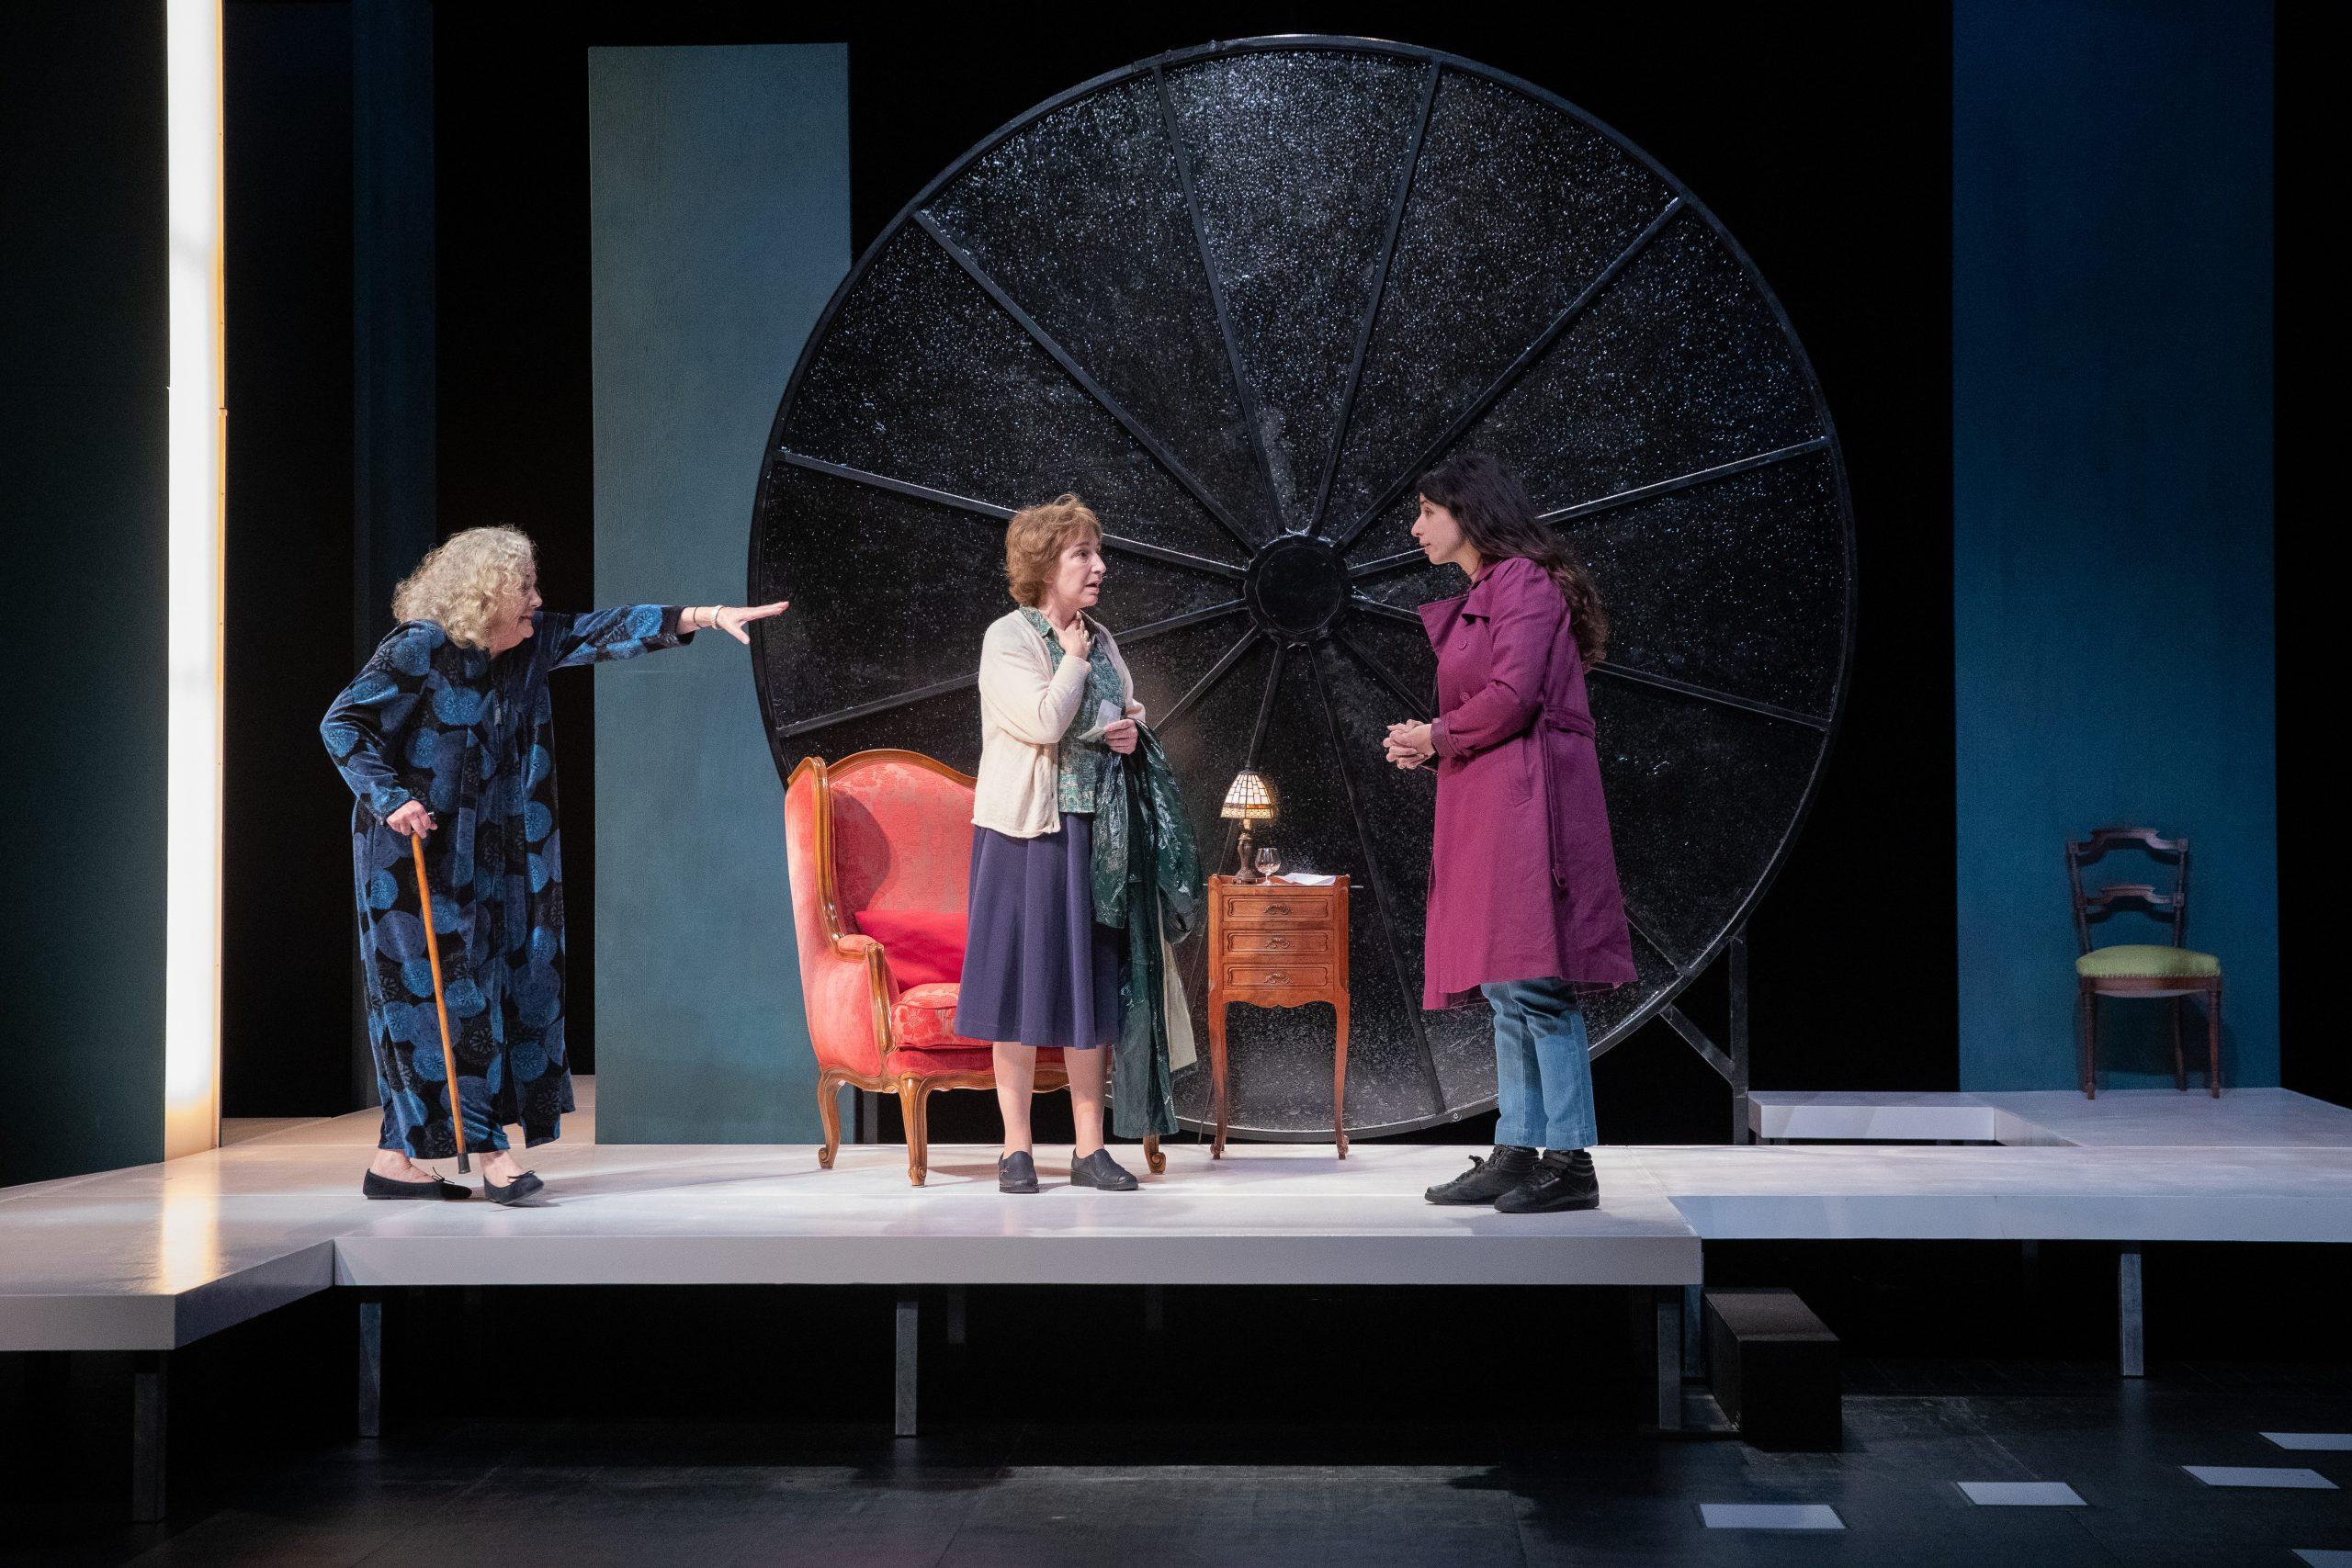 TROIS FEMMES (Catherine Anne 2019)